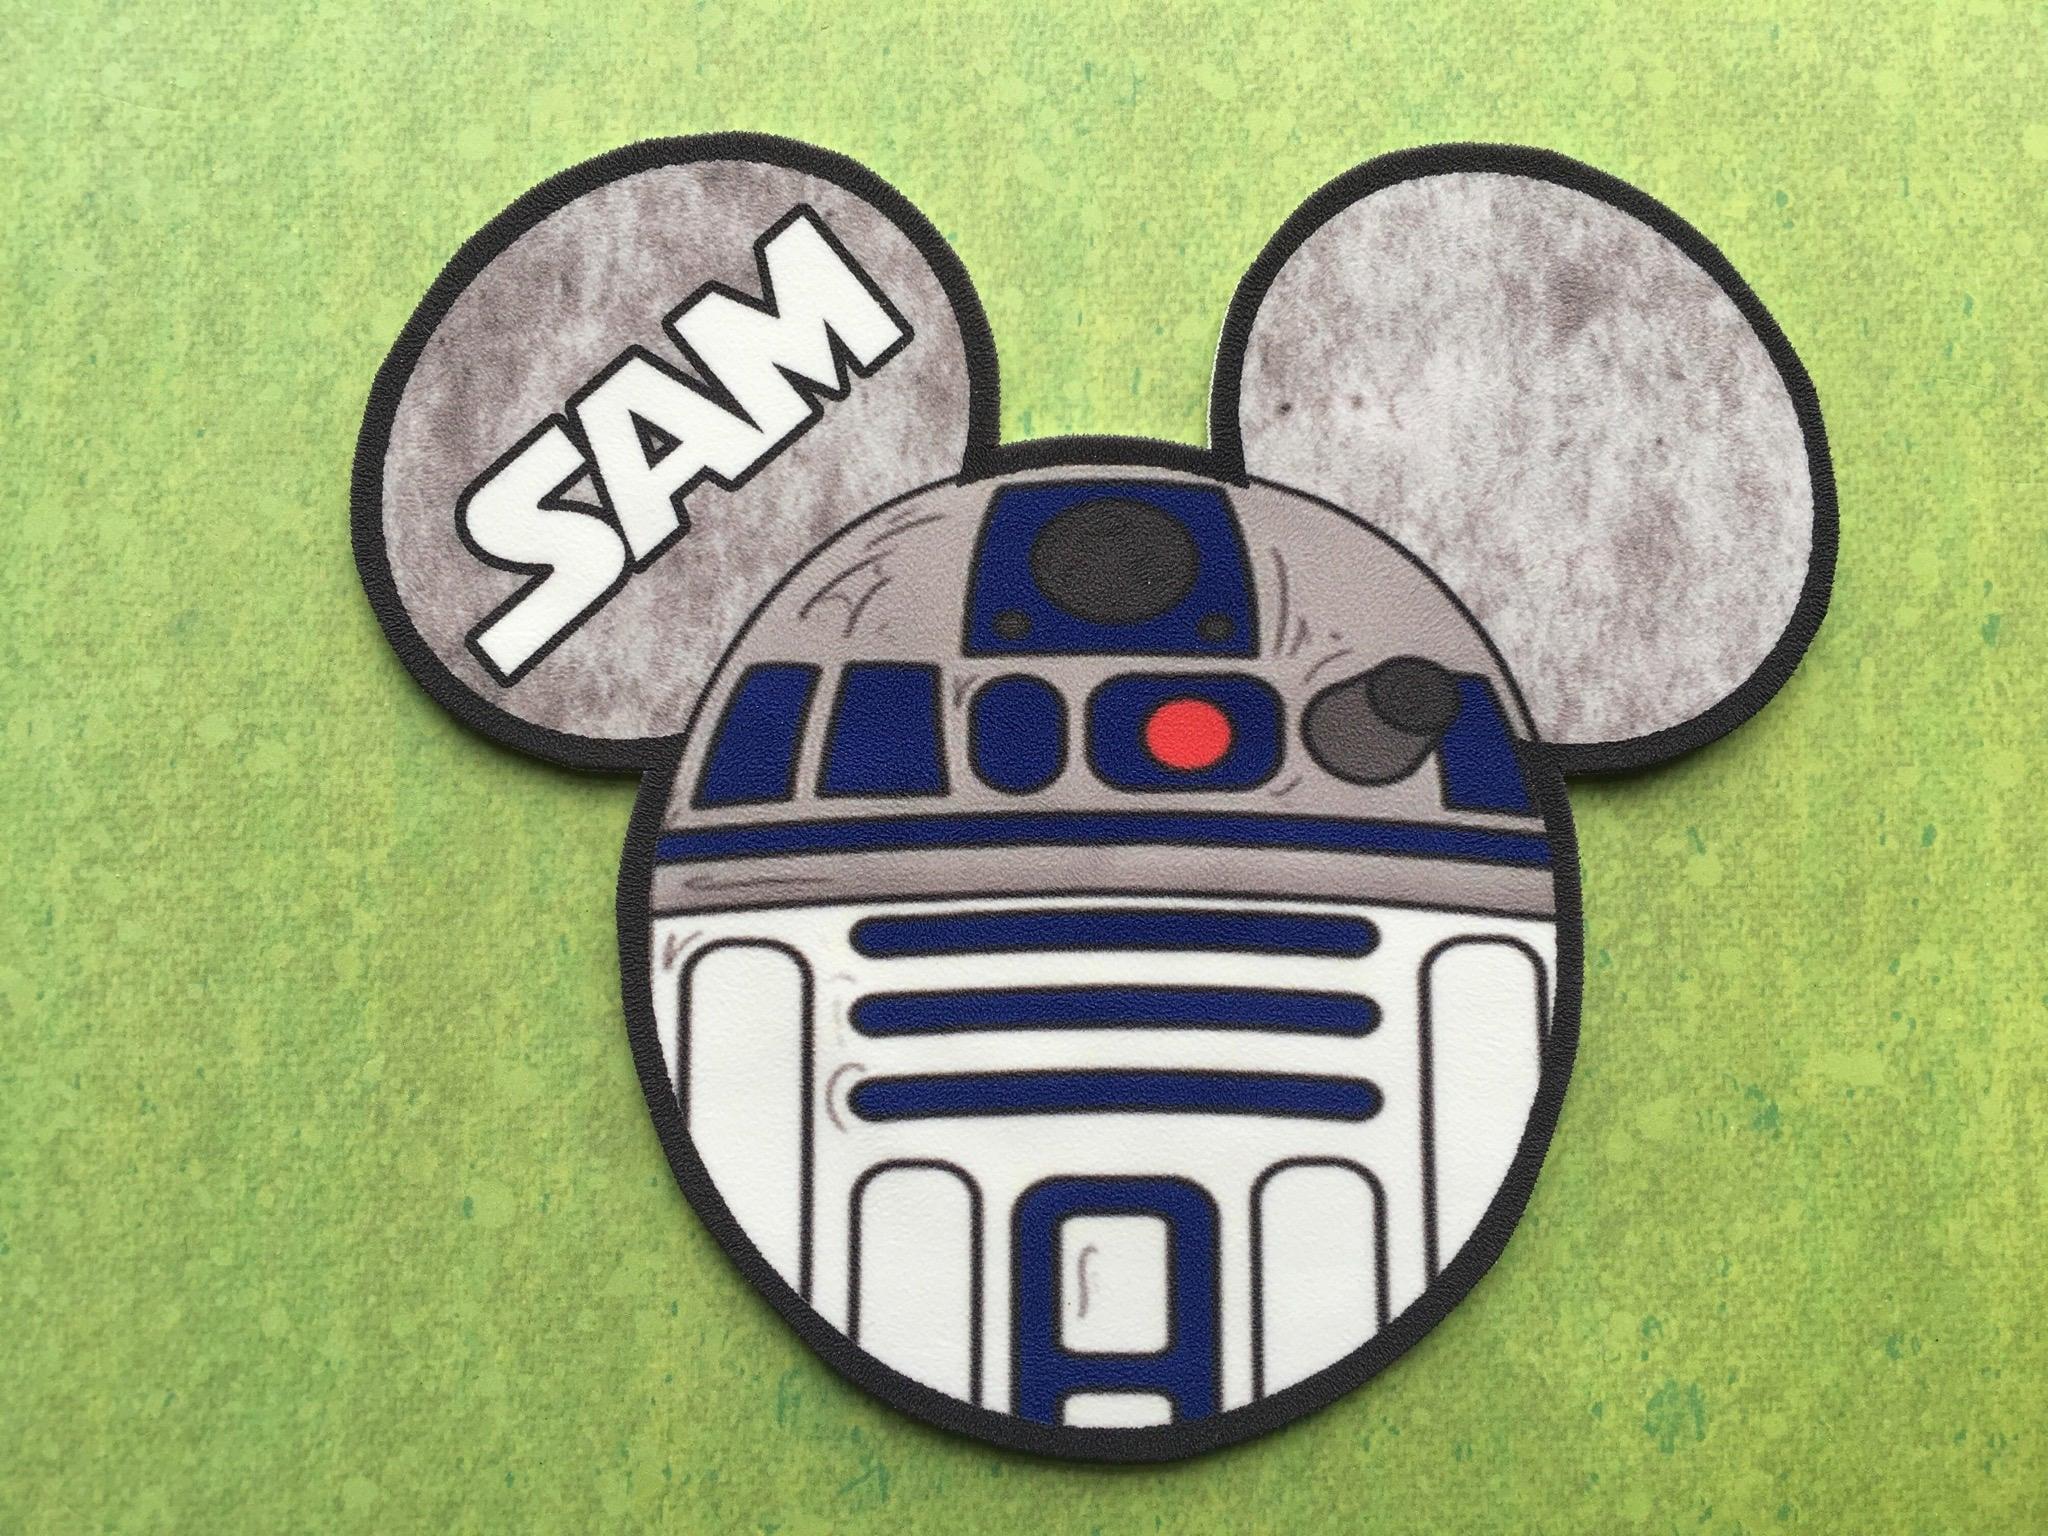 Disney Cruise Door Magnet Star Wars Magnet R2d2 Magnet